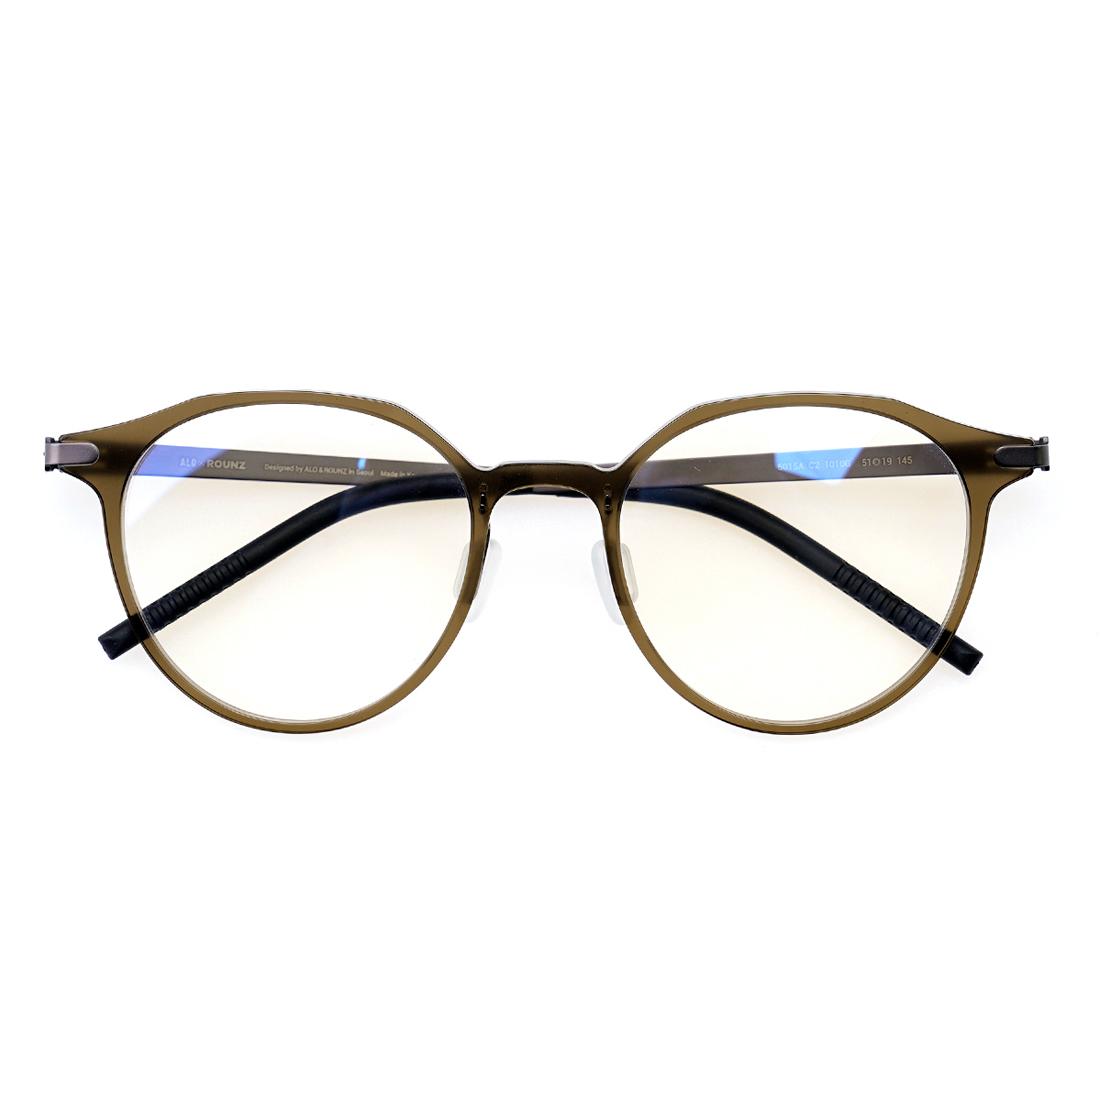 [ALOXROUNZ] AR5015A C2 카키그레이 초경량 안경테